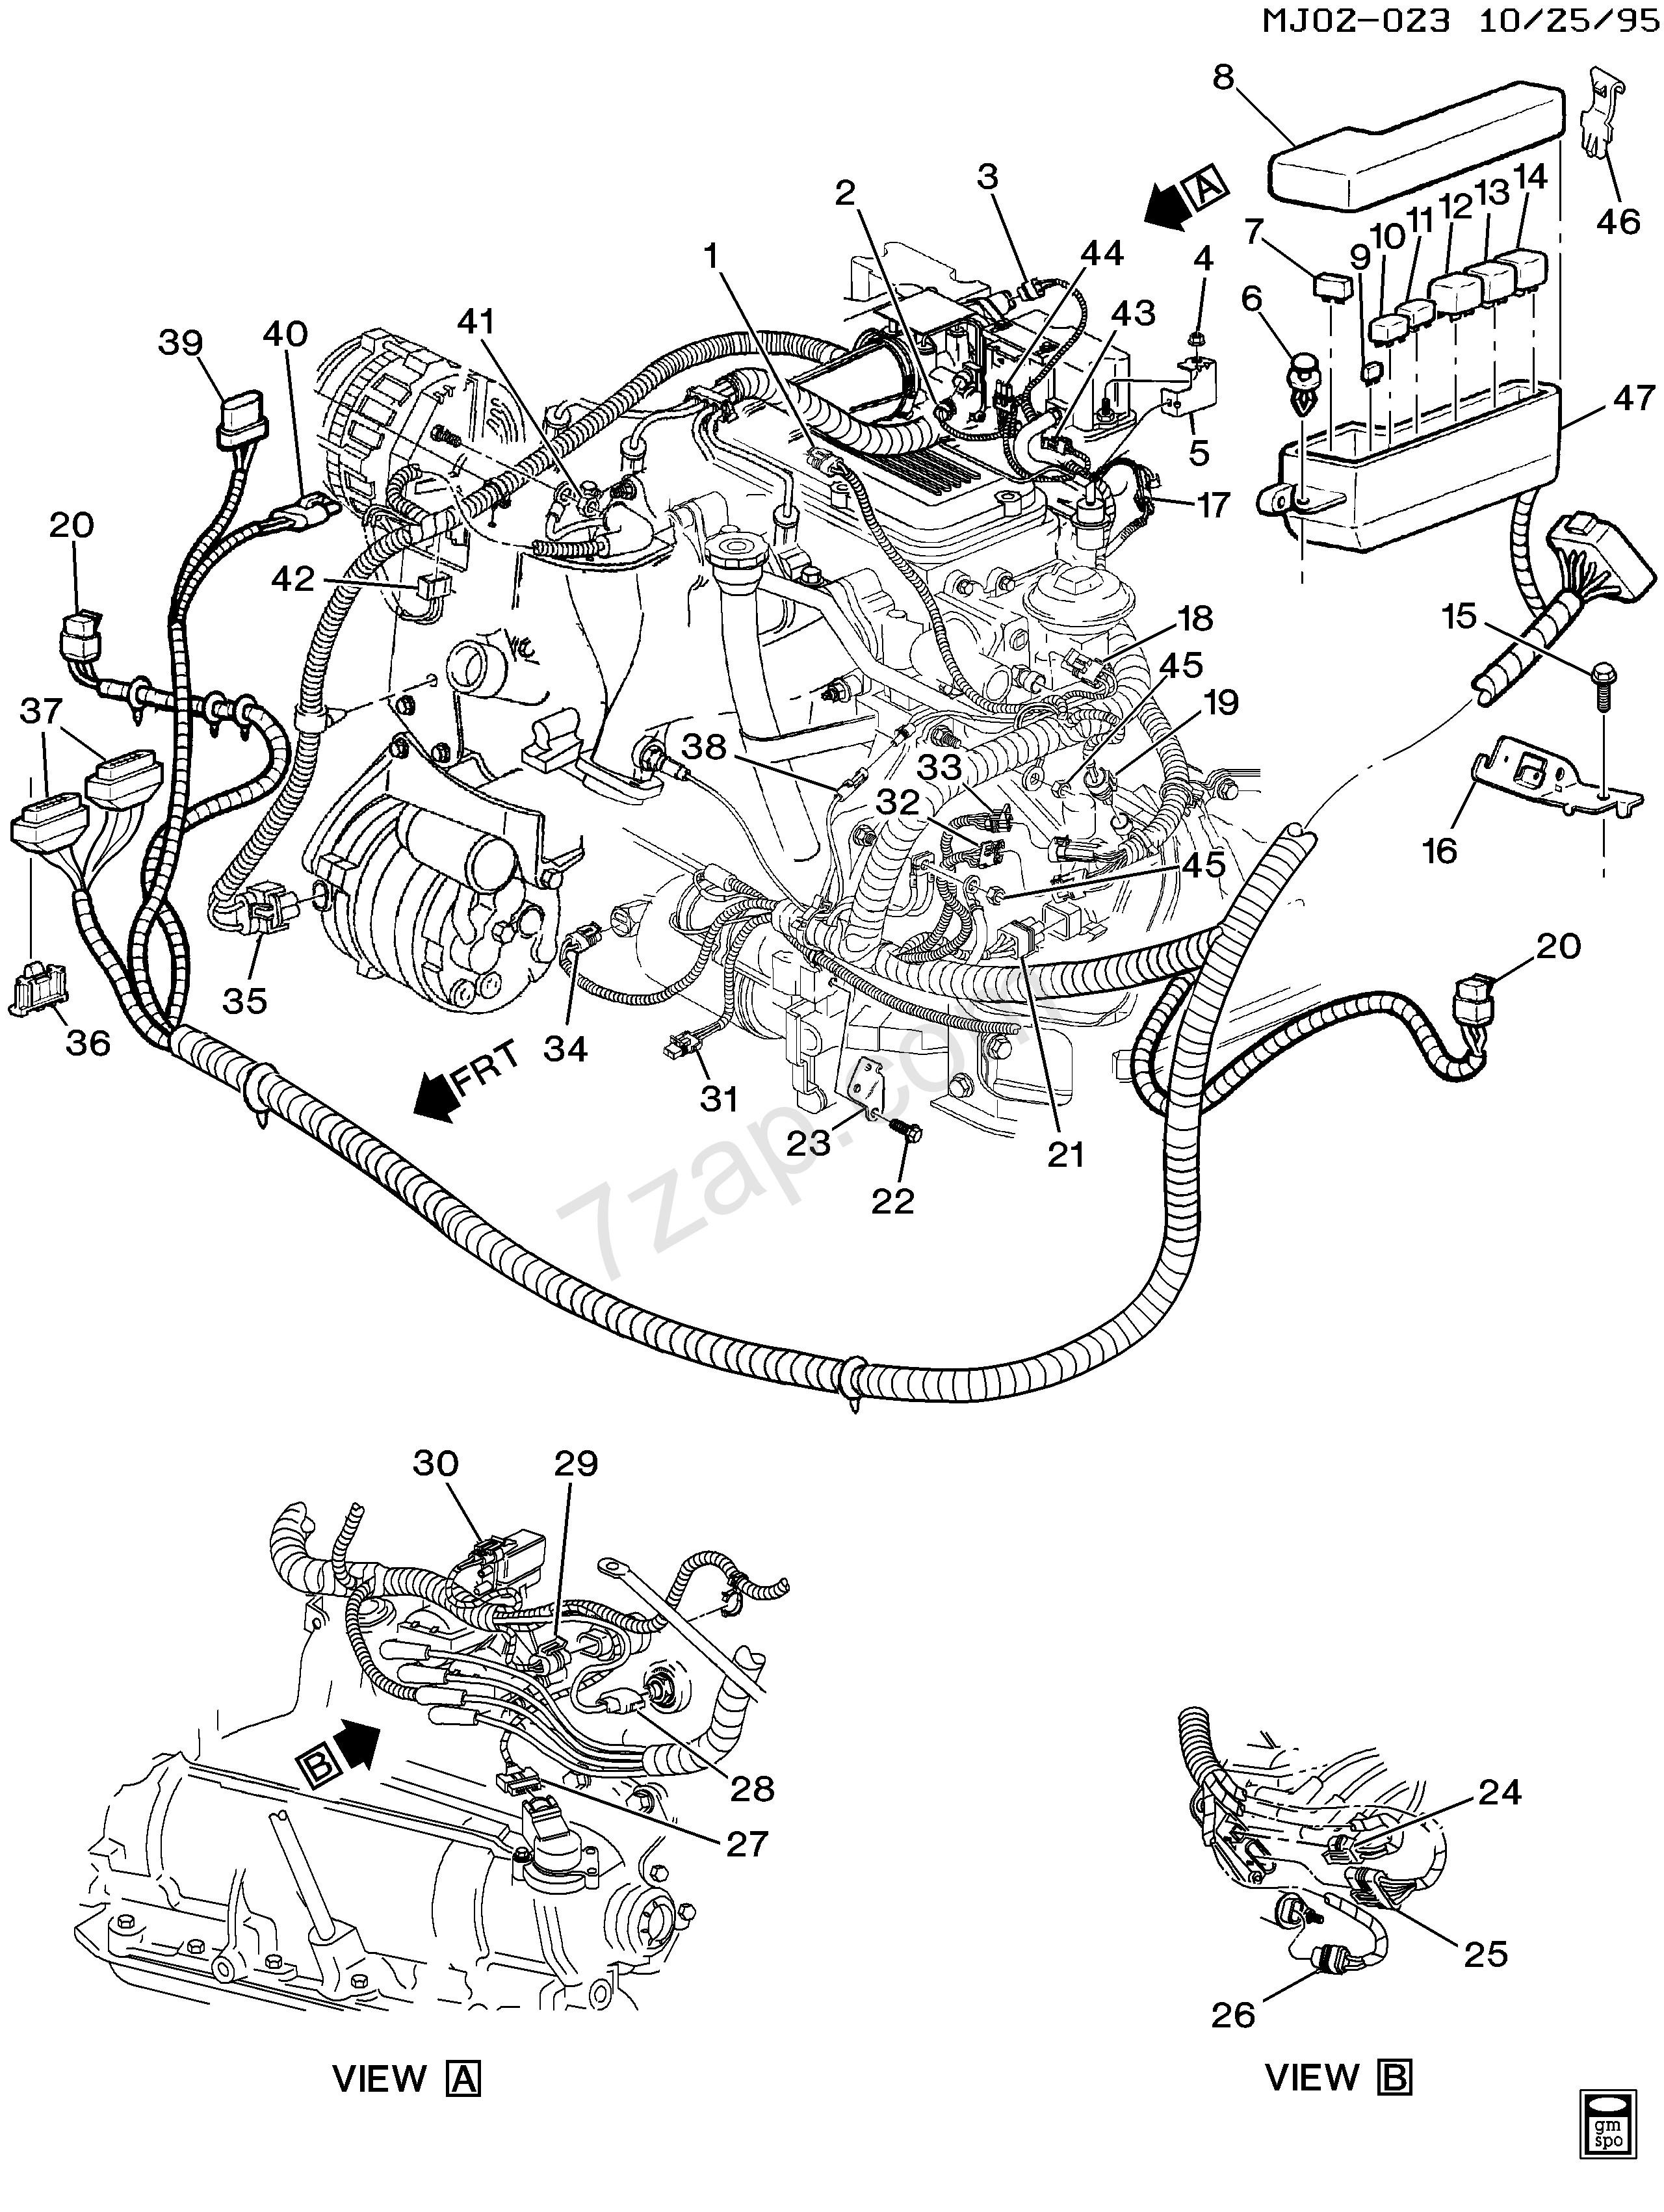 2002 Chevy Cavalier Engine Diagram 1996 2002 J Wiring Harness Engine Ln2 2 2 4 Chevrolet